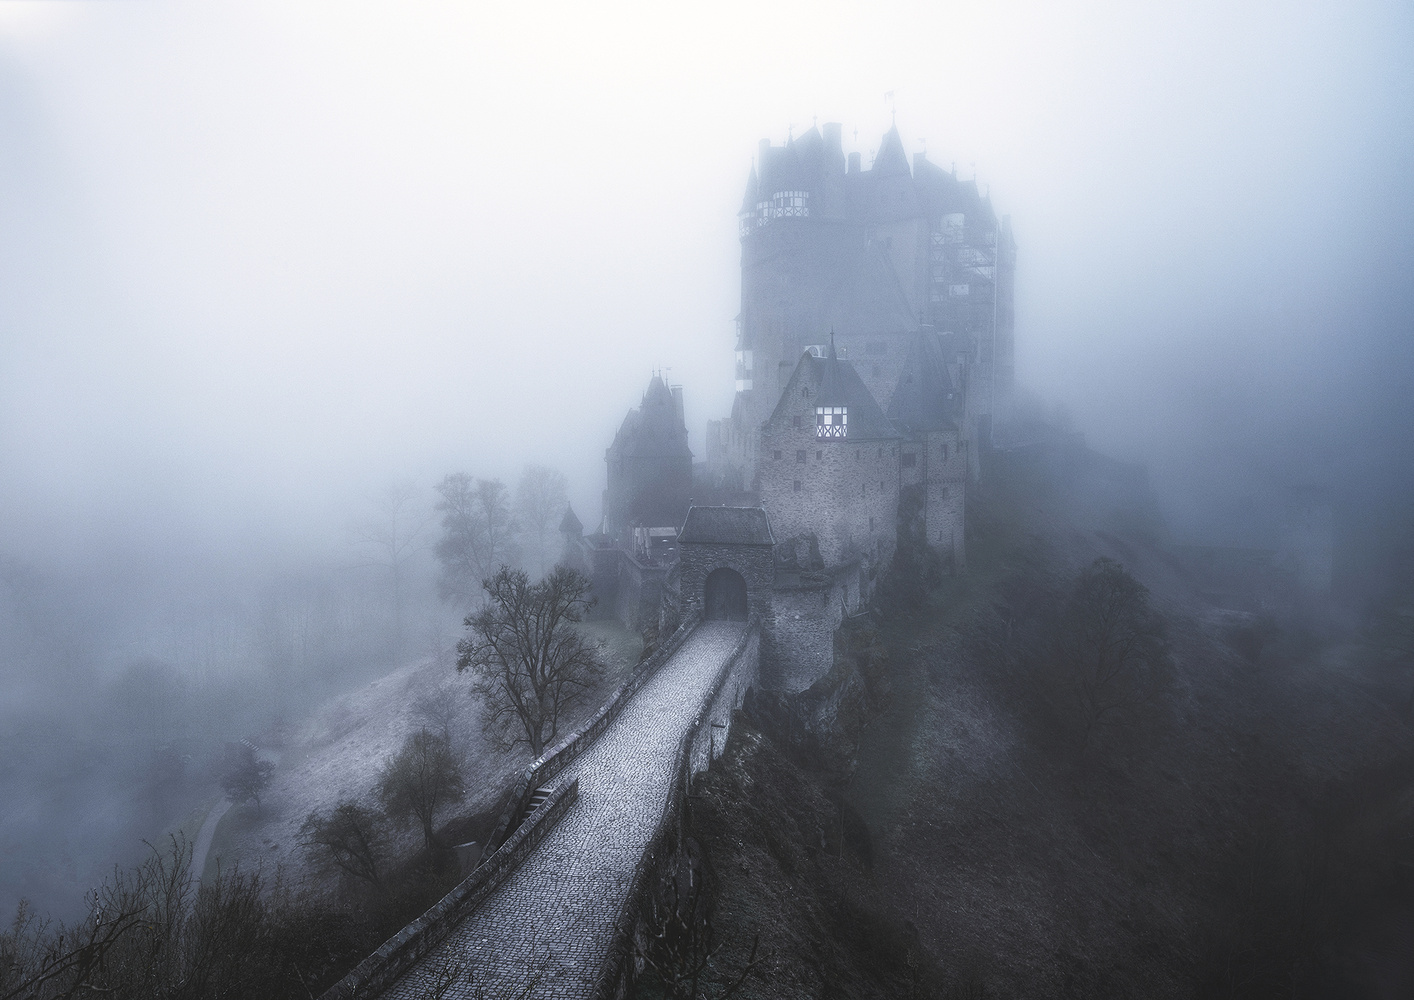 Foggy Eltz by Philip Slotte